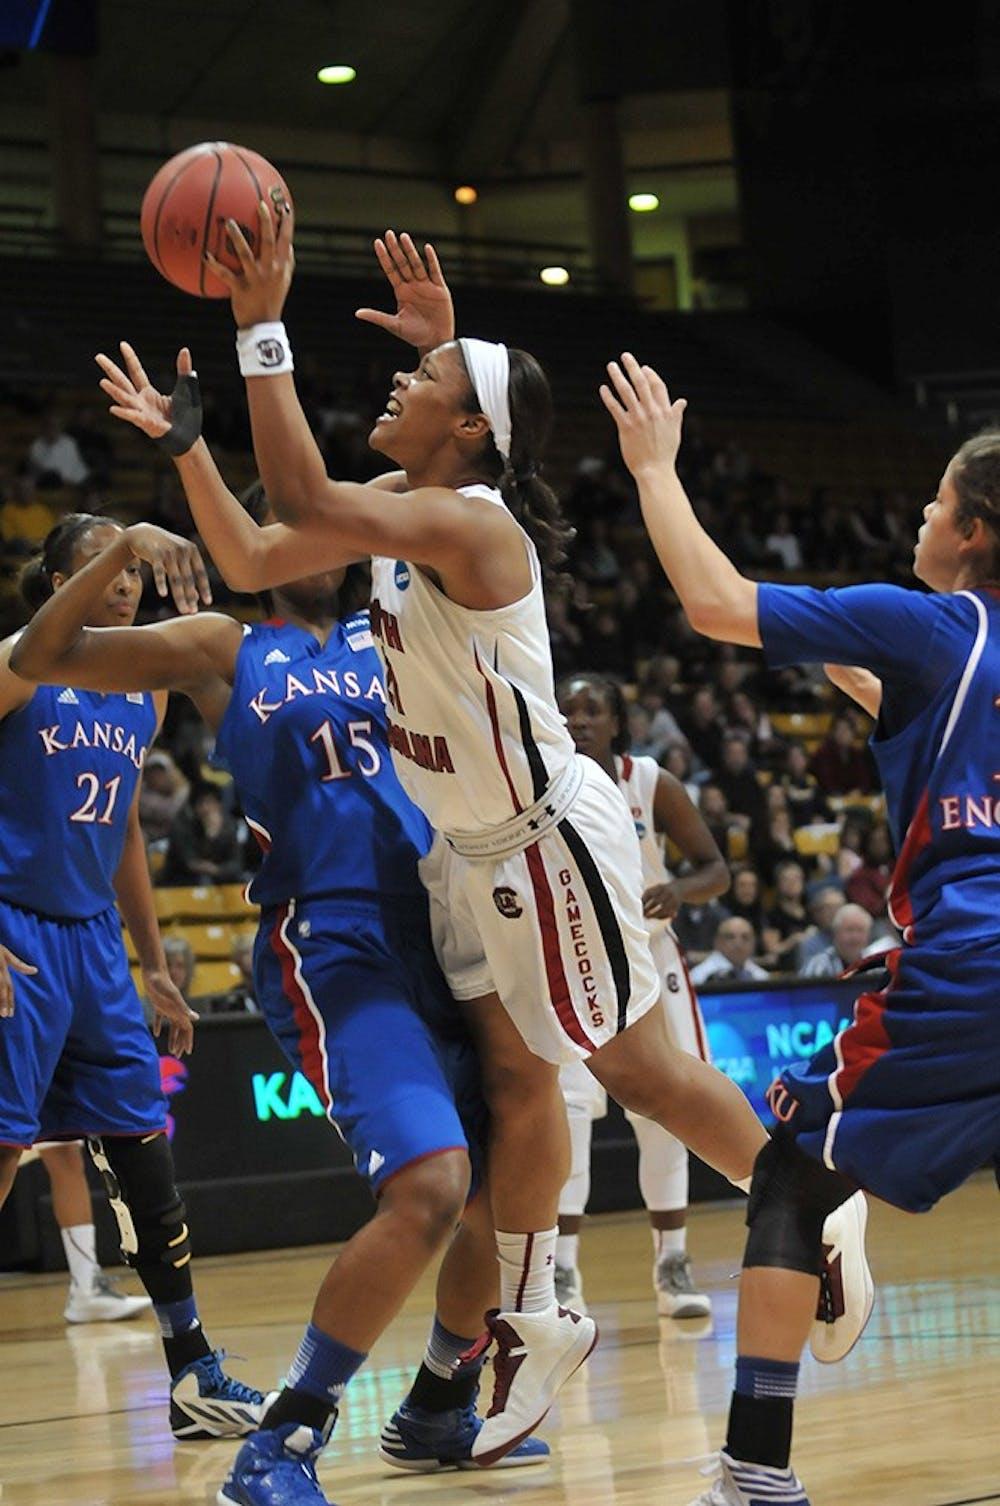 <p>The women's basketball team fell 75-69 to Kansas.</p>